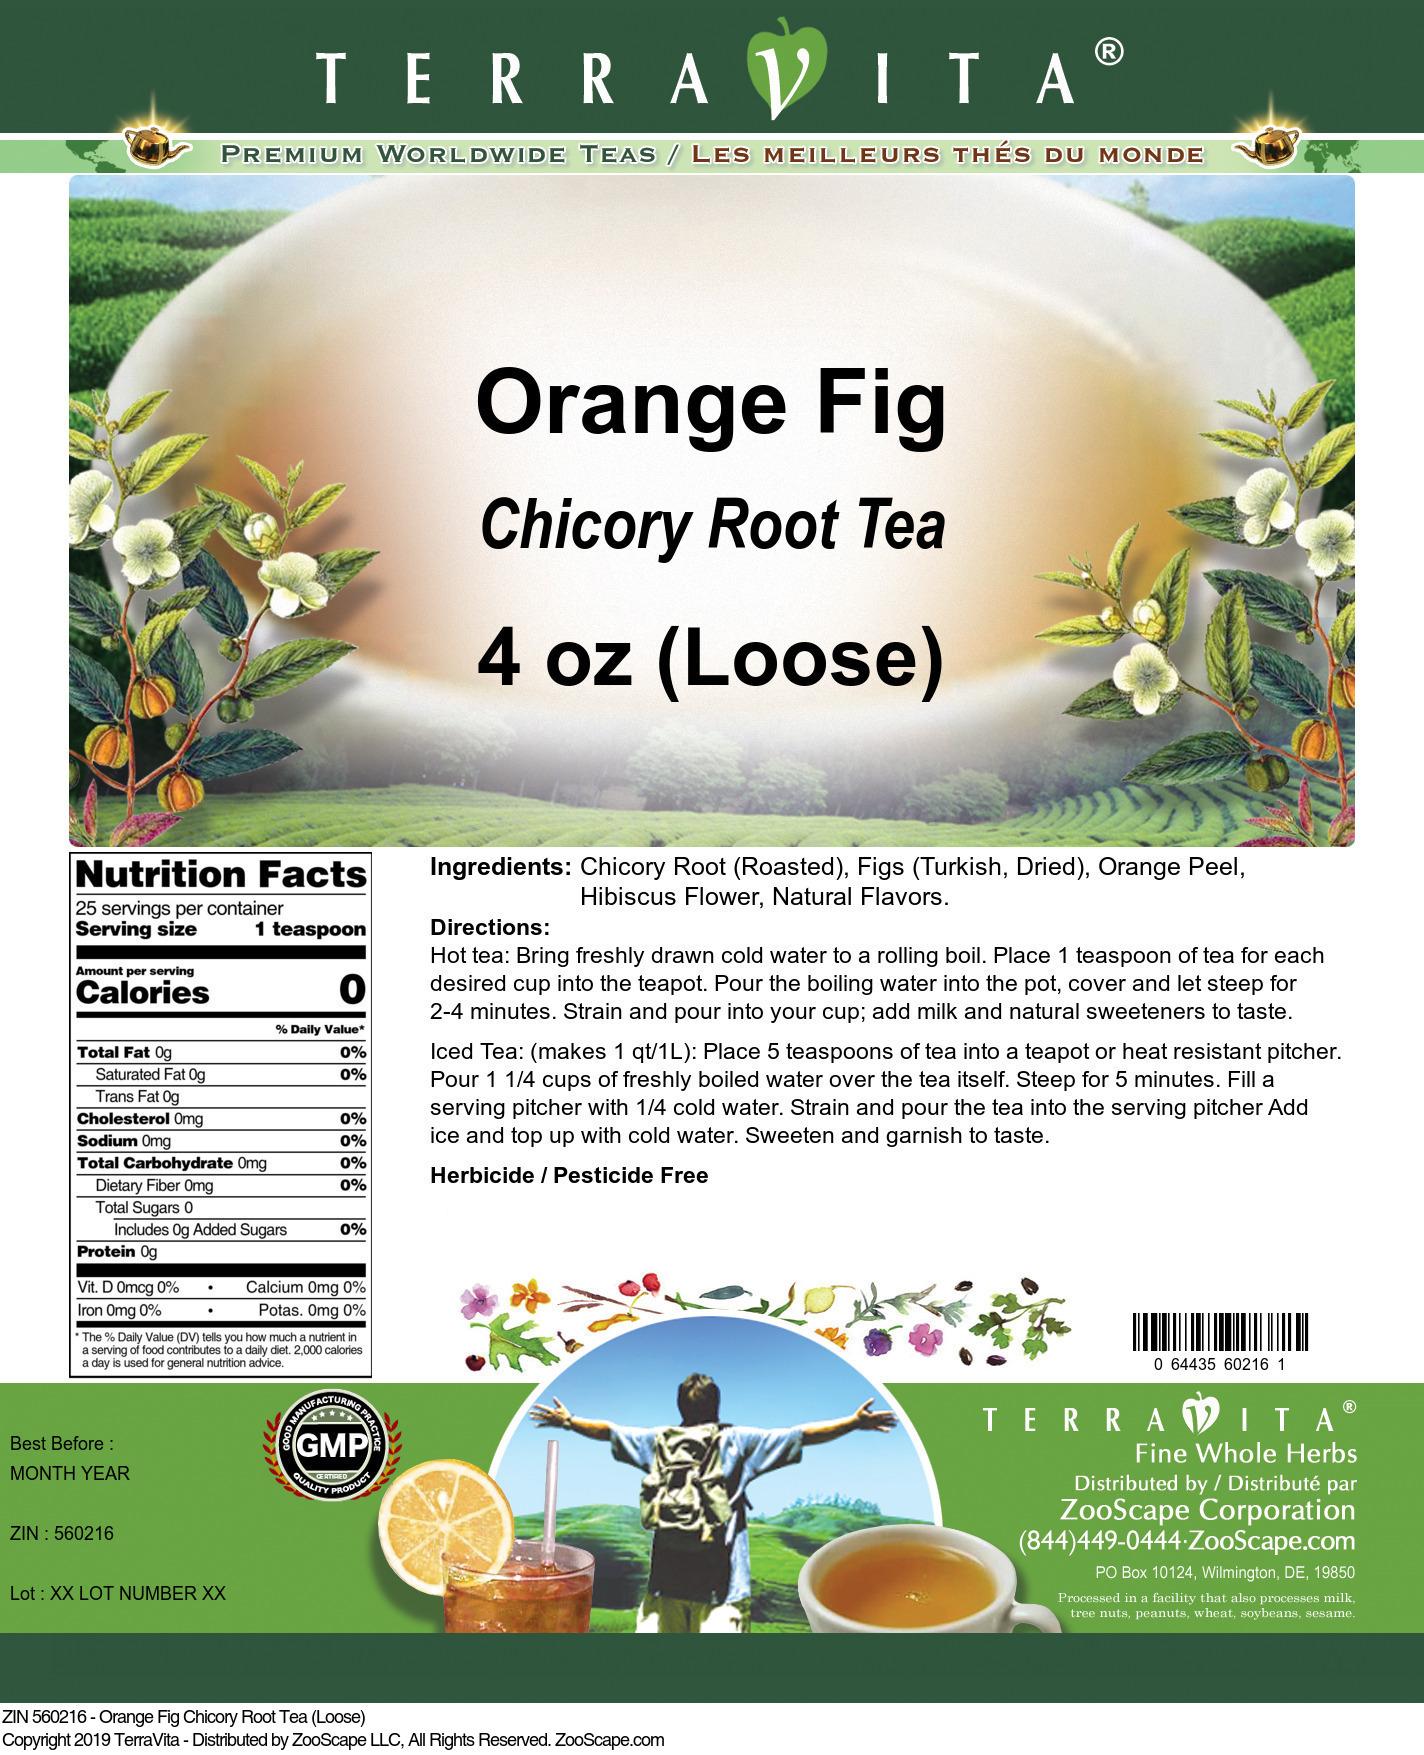 Orange Fig Chicory Root